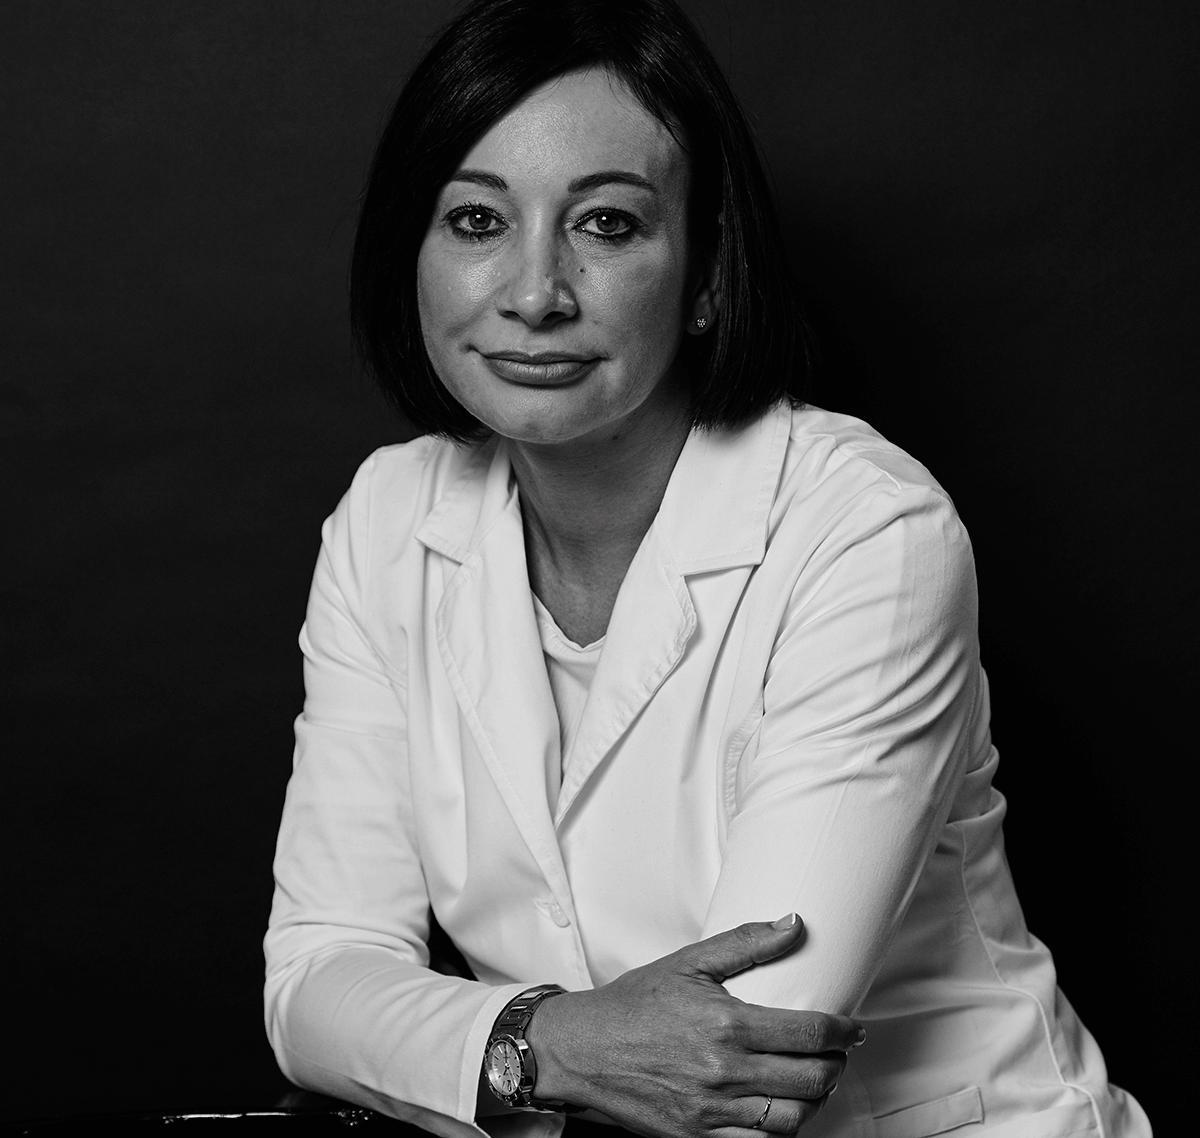 Clínica Vermont Eva Hidalgo